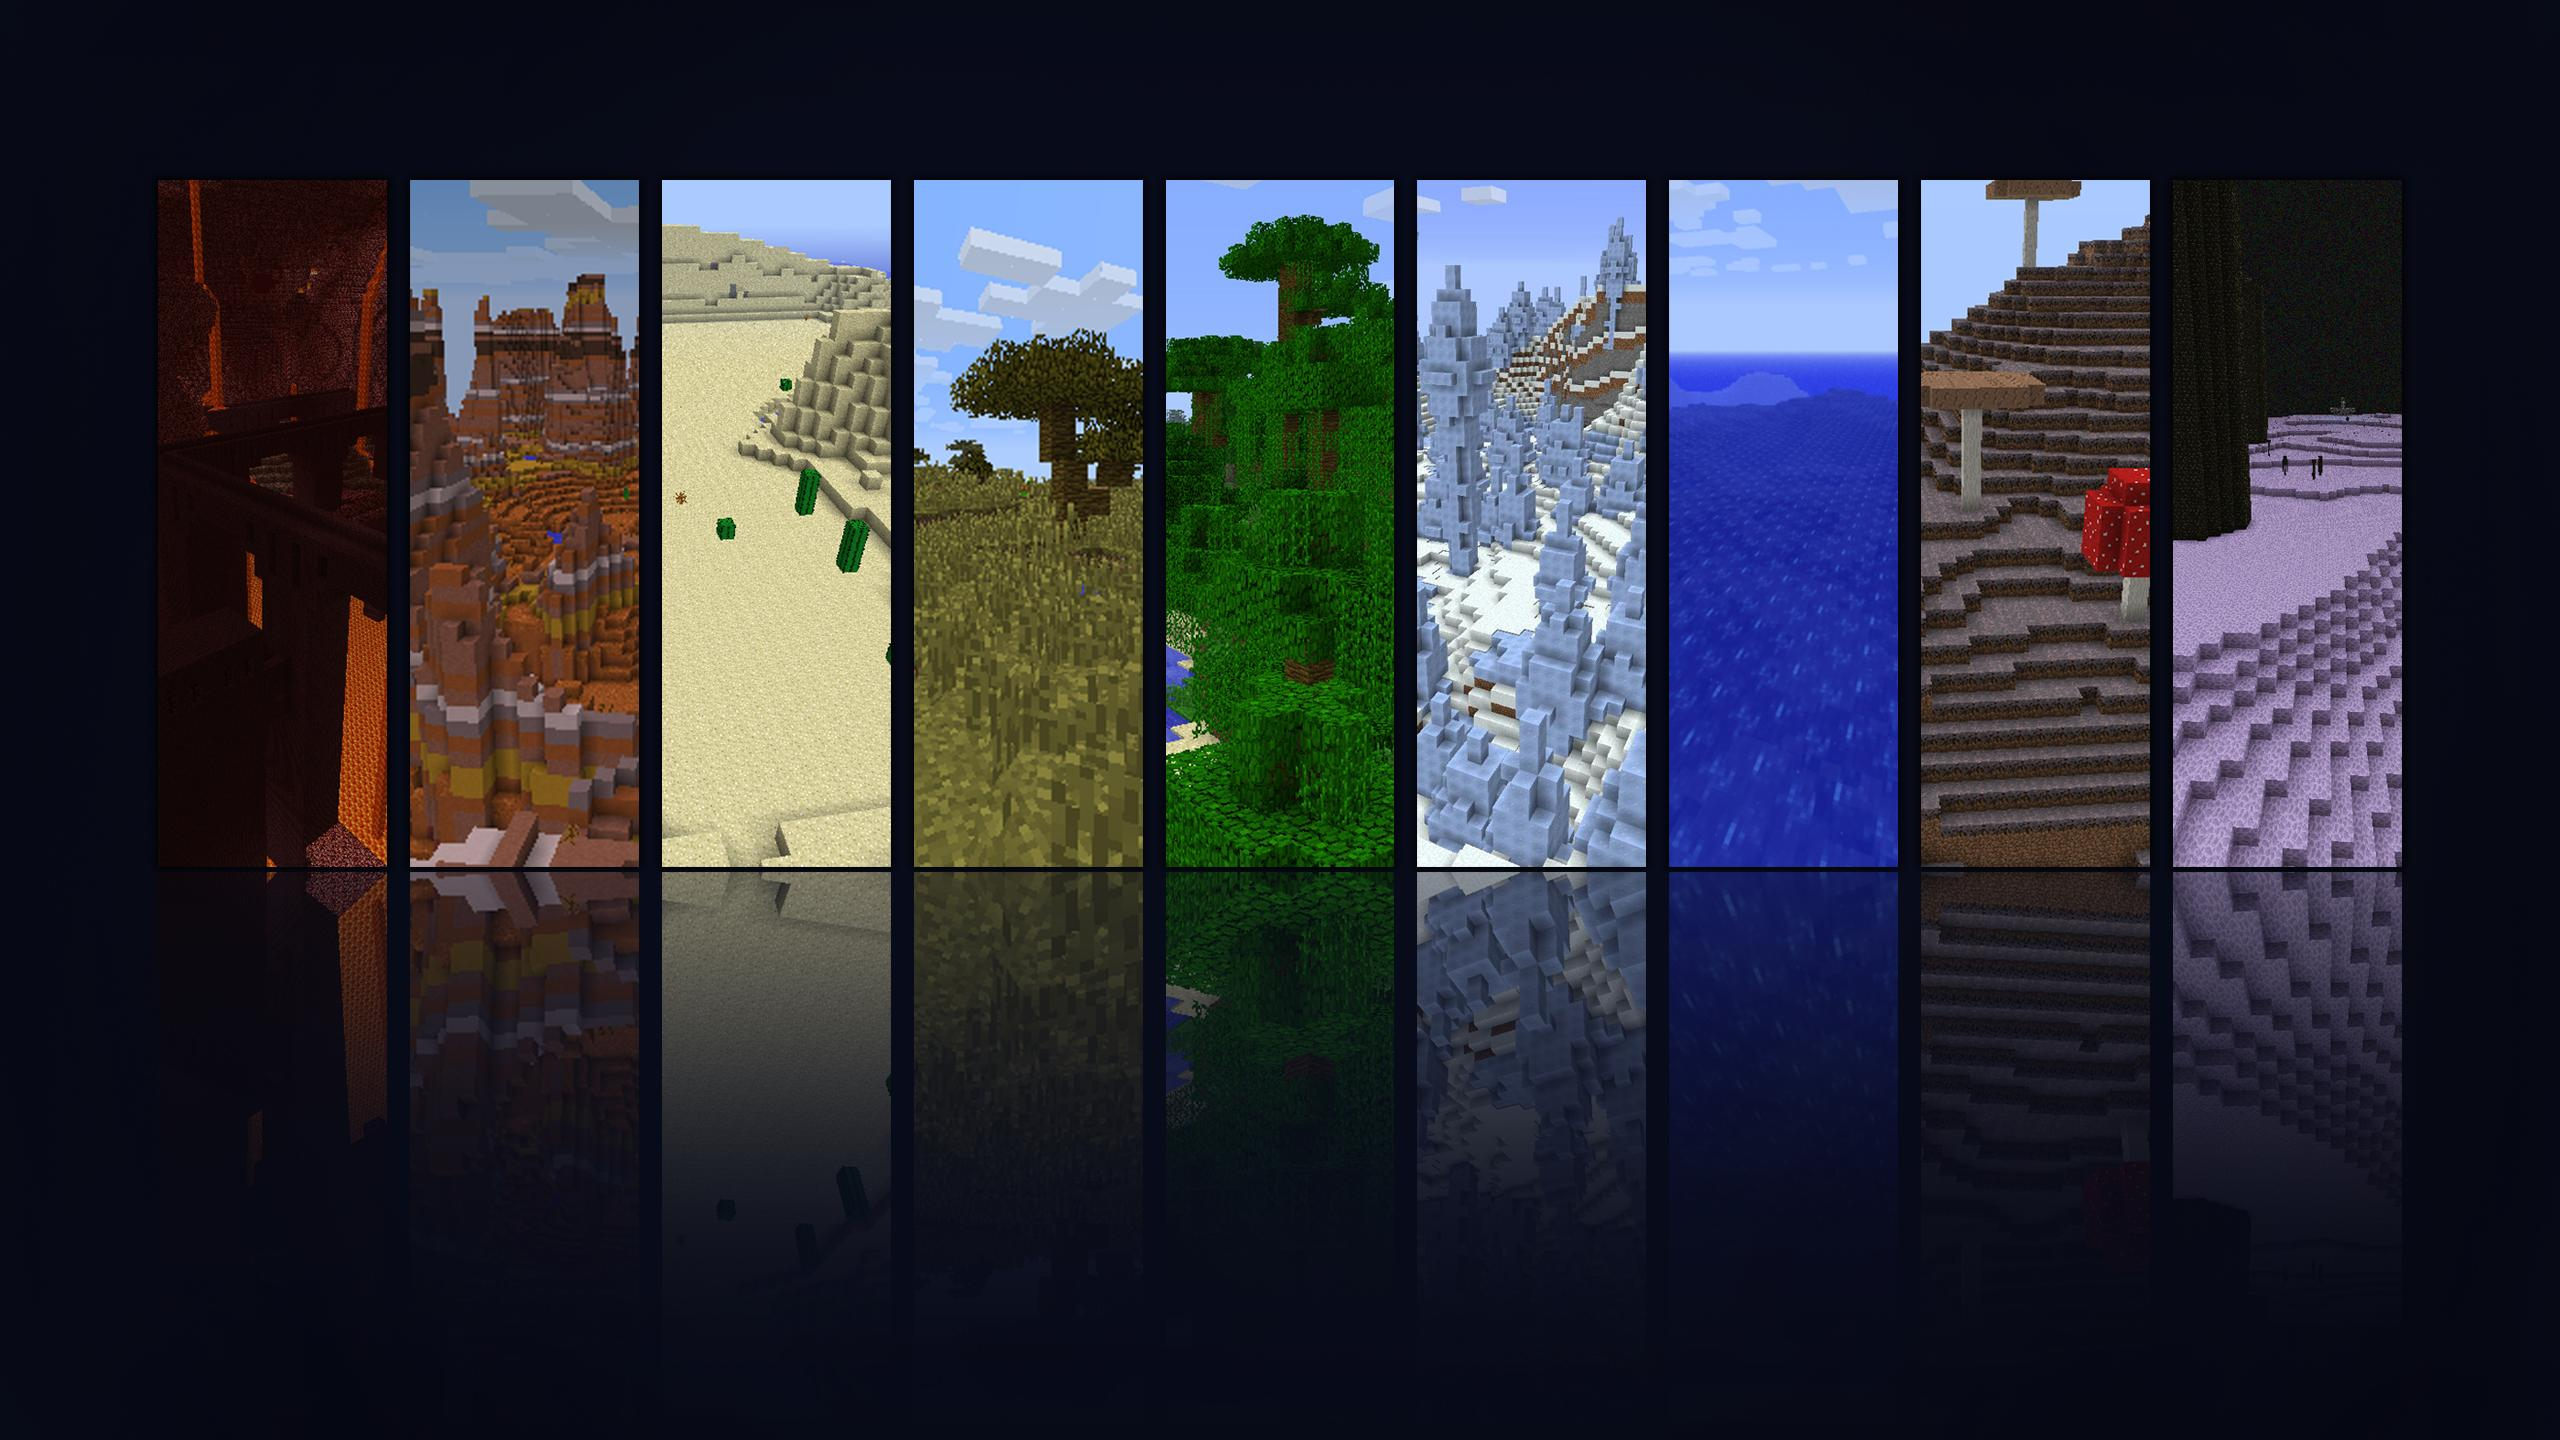 Minecraft Top Wallpapers for your desktop 1920 x 1080 plus 2560x1440